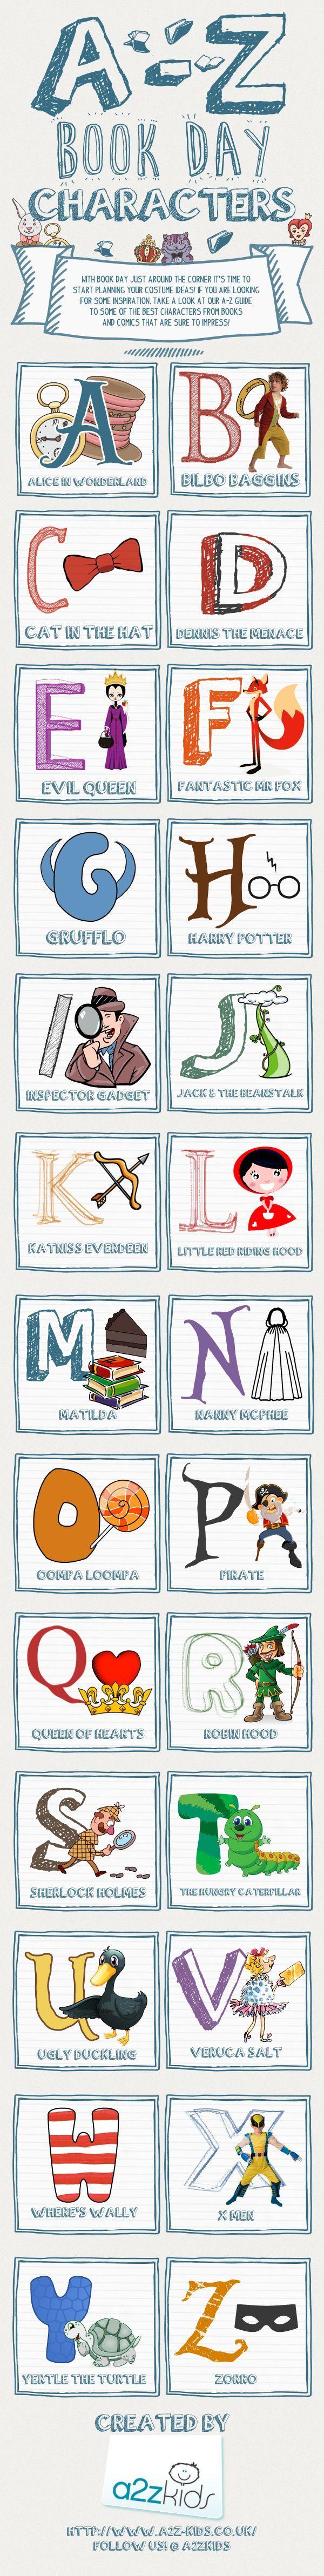 Fabulous Ideas For World Book Day including fancy dress ideas